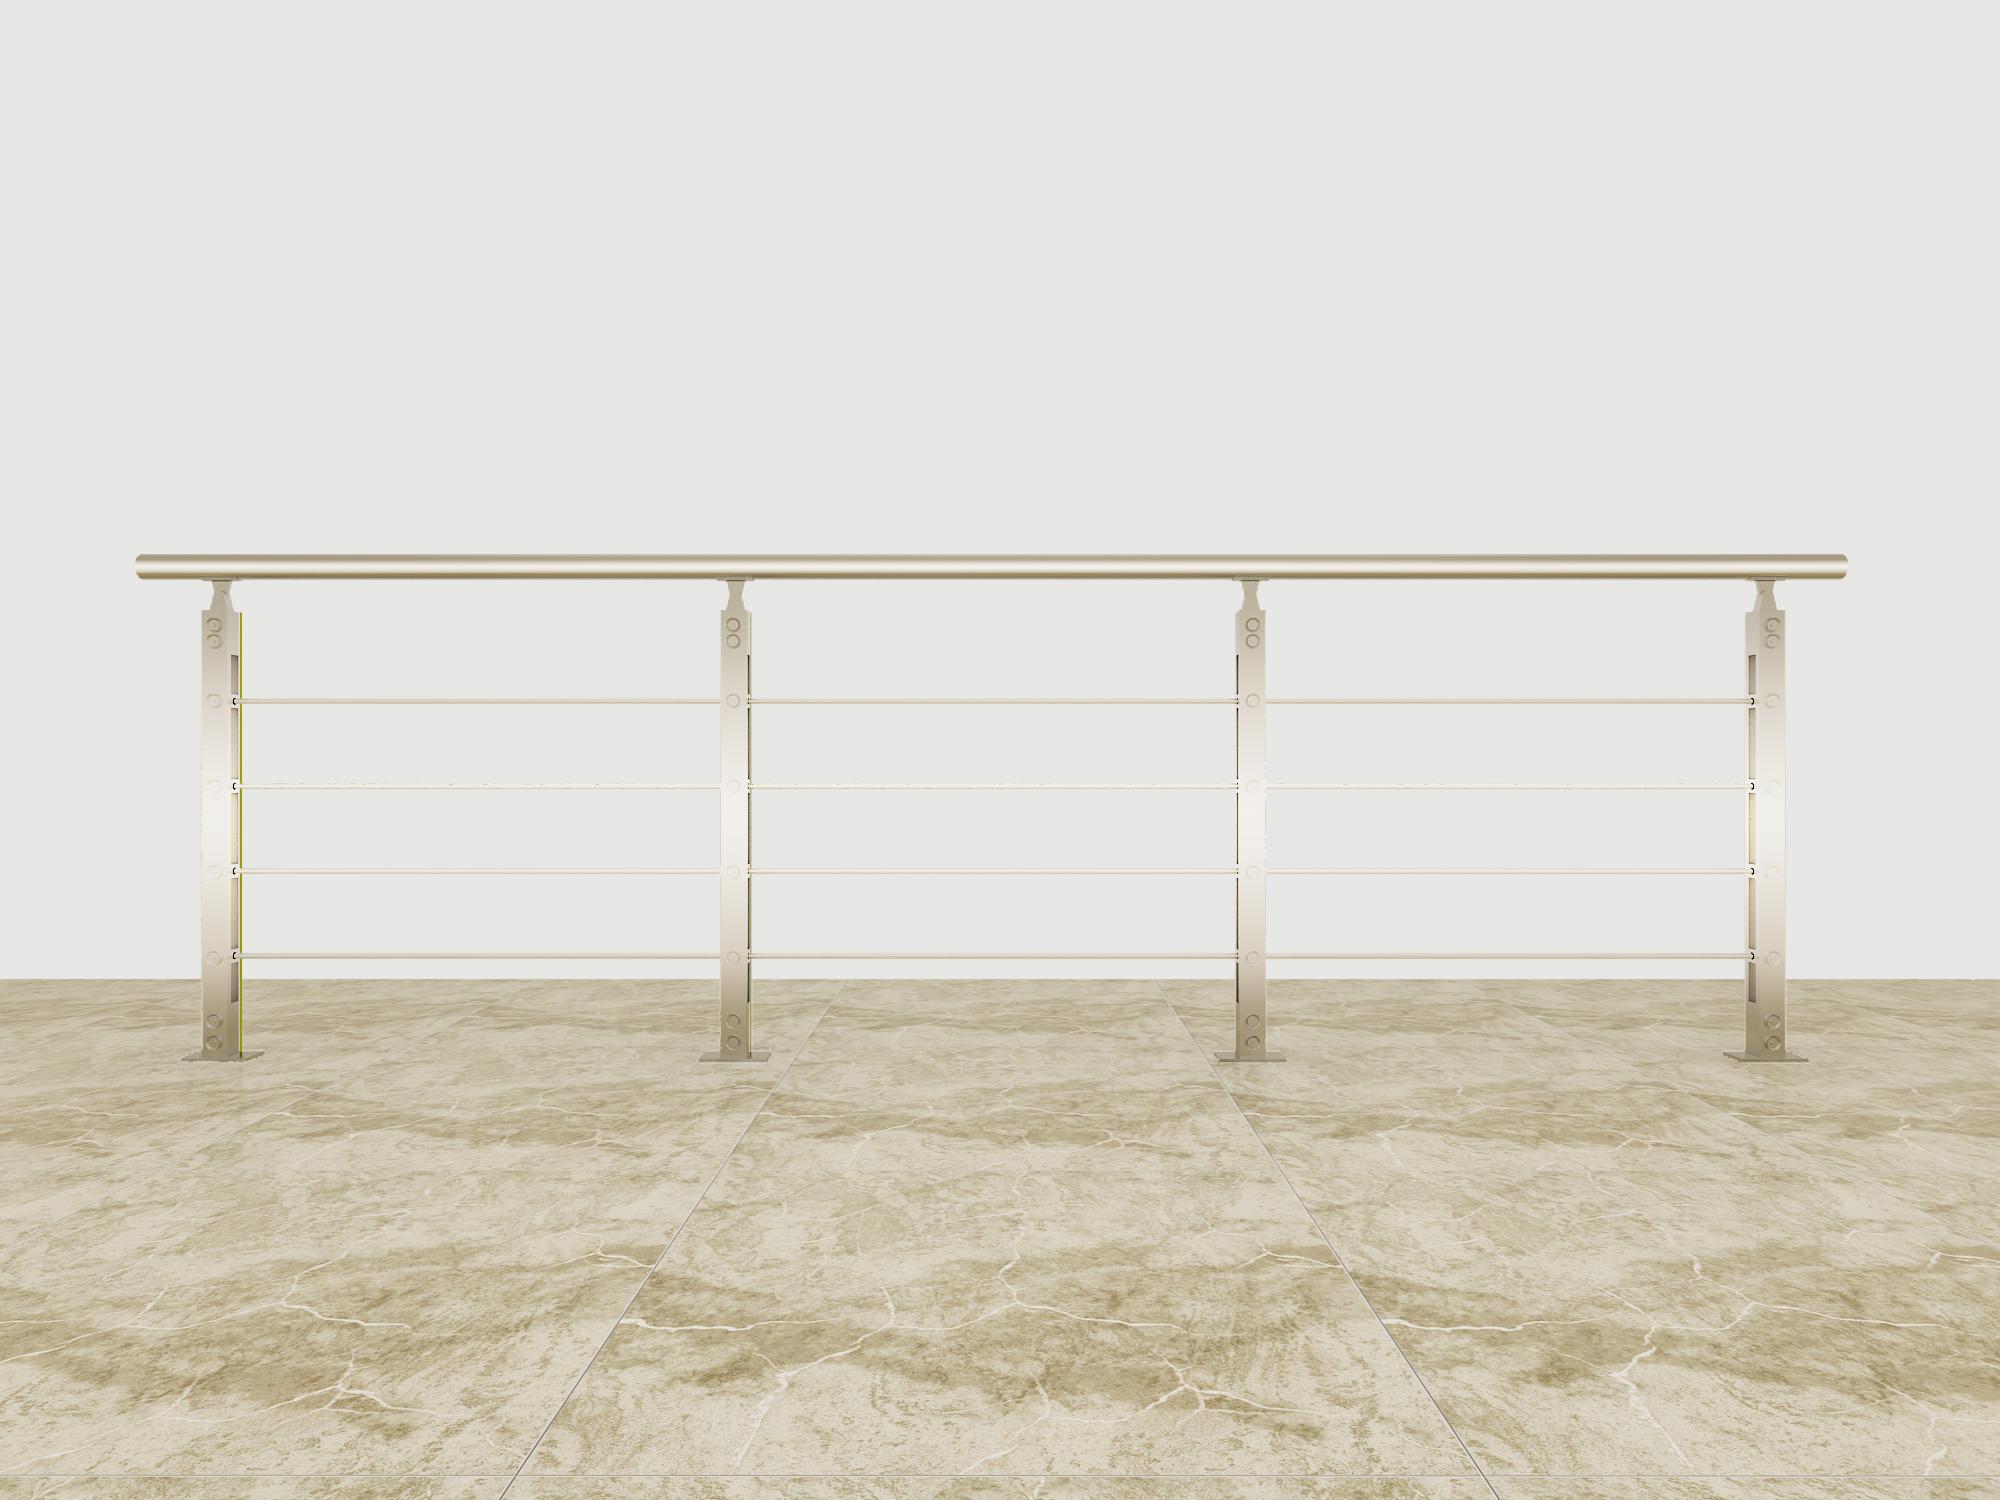 Hot Selling Good Quality Classic Design Aluminum solid-rod railing AR001